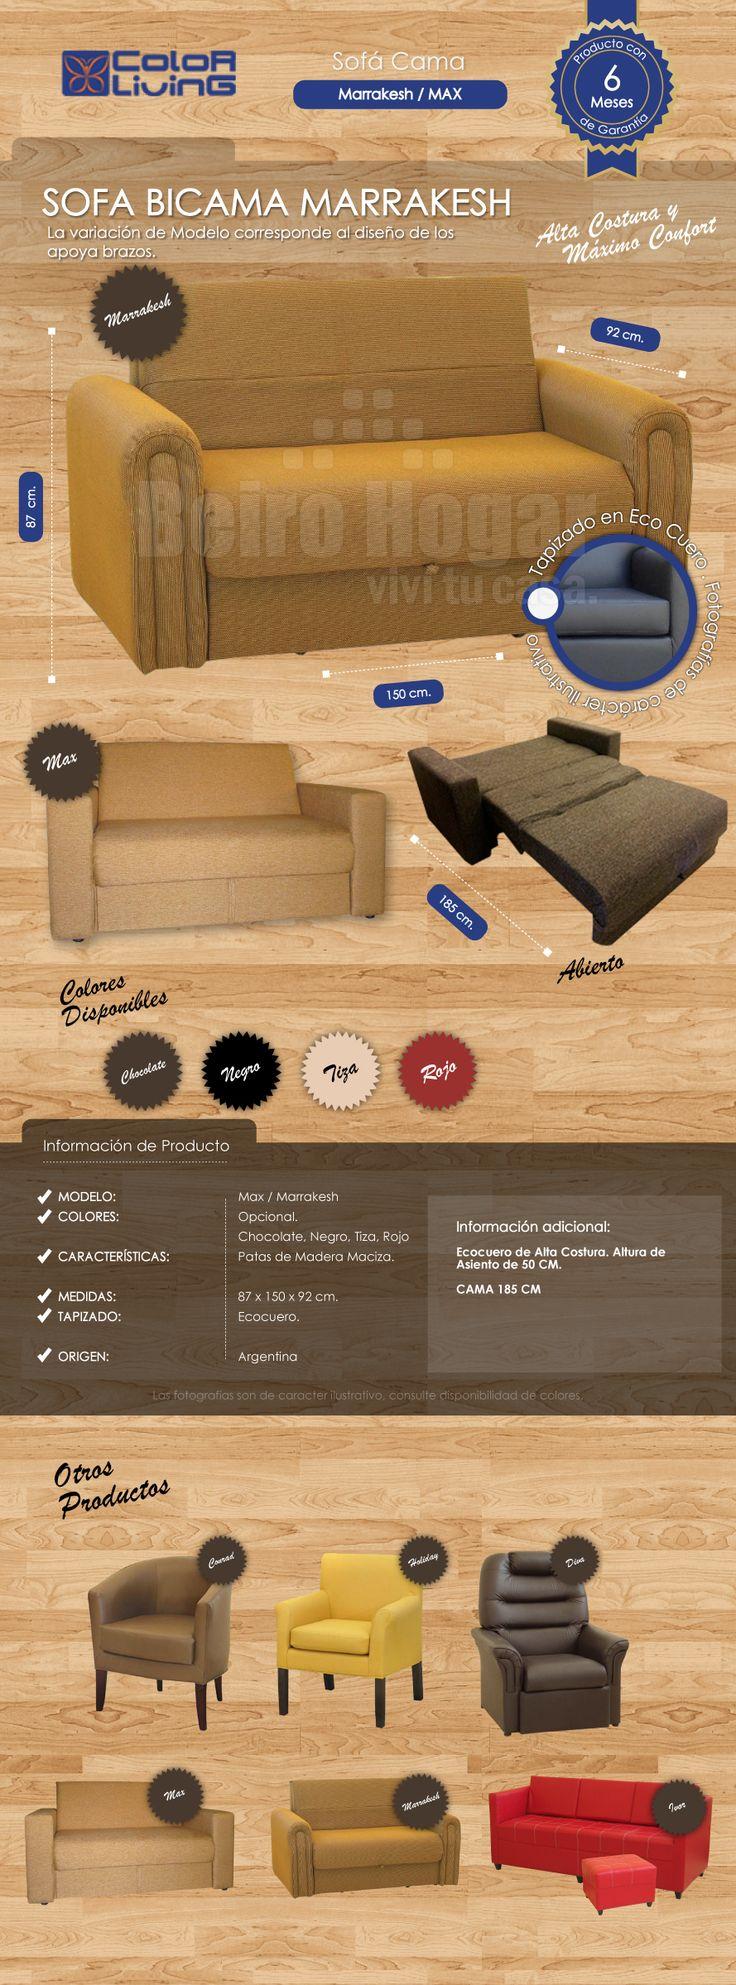 Sofa Cama 2 Plazas Bicama Marrakesh Sillon 2cuerpos Ecocuero - $ 4.399,99 en MercadoLibre